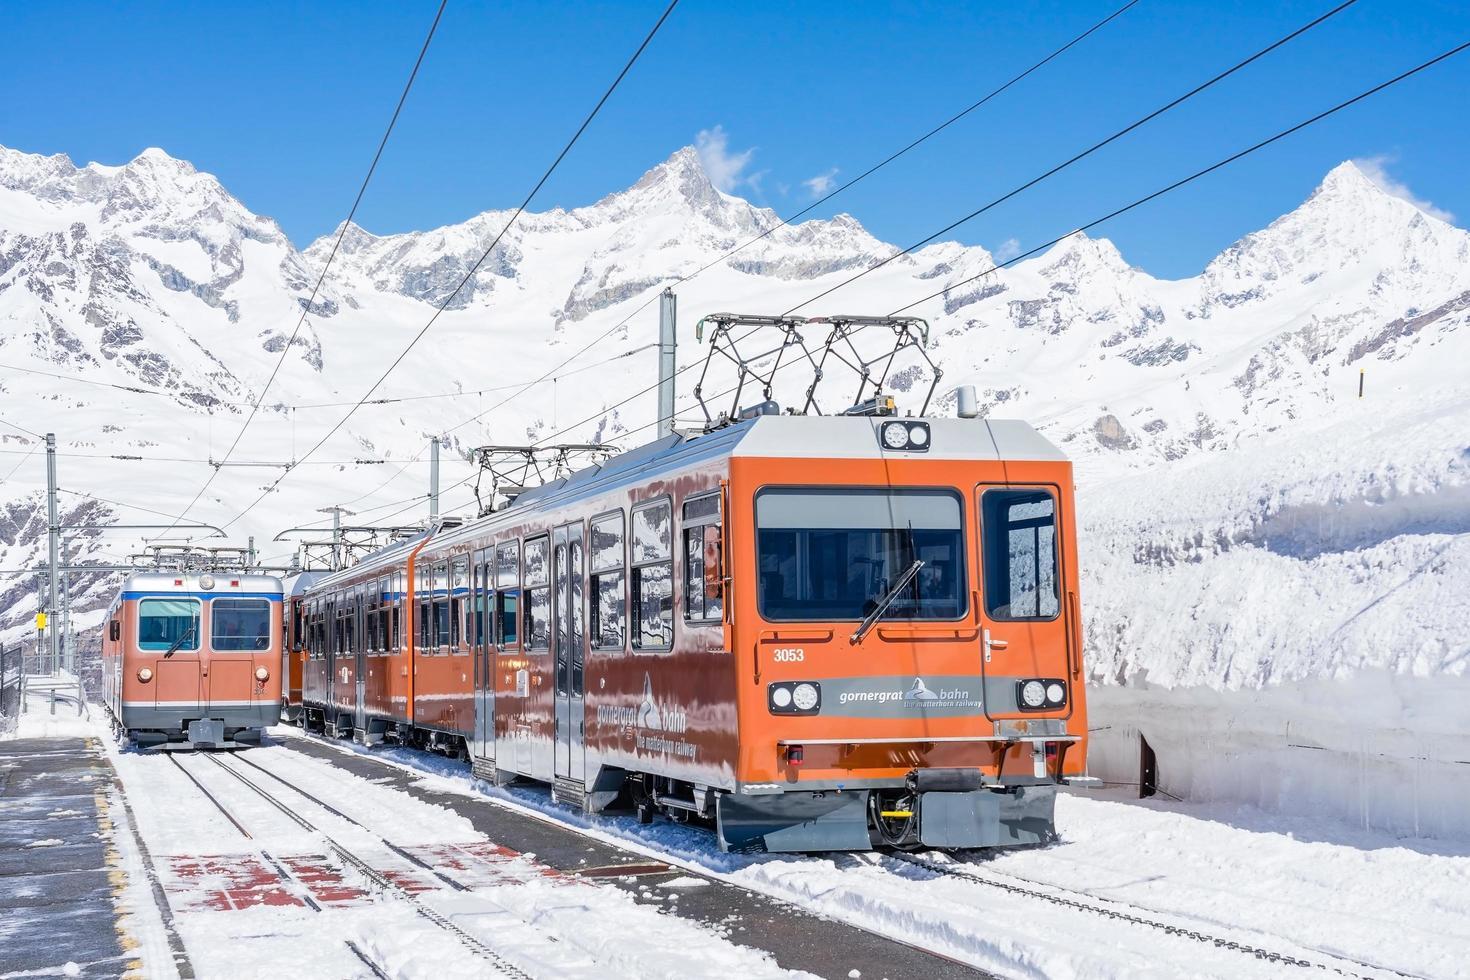 El Matterhorn Gotthard Bahn en Riffelberg, Suiza foto